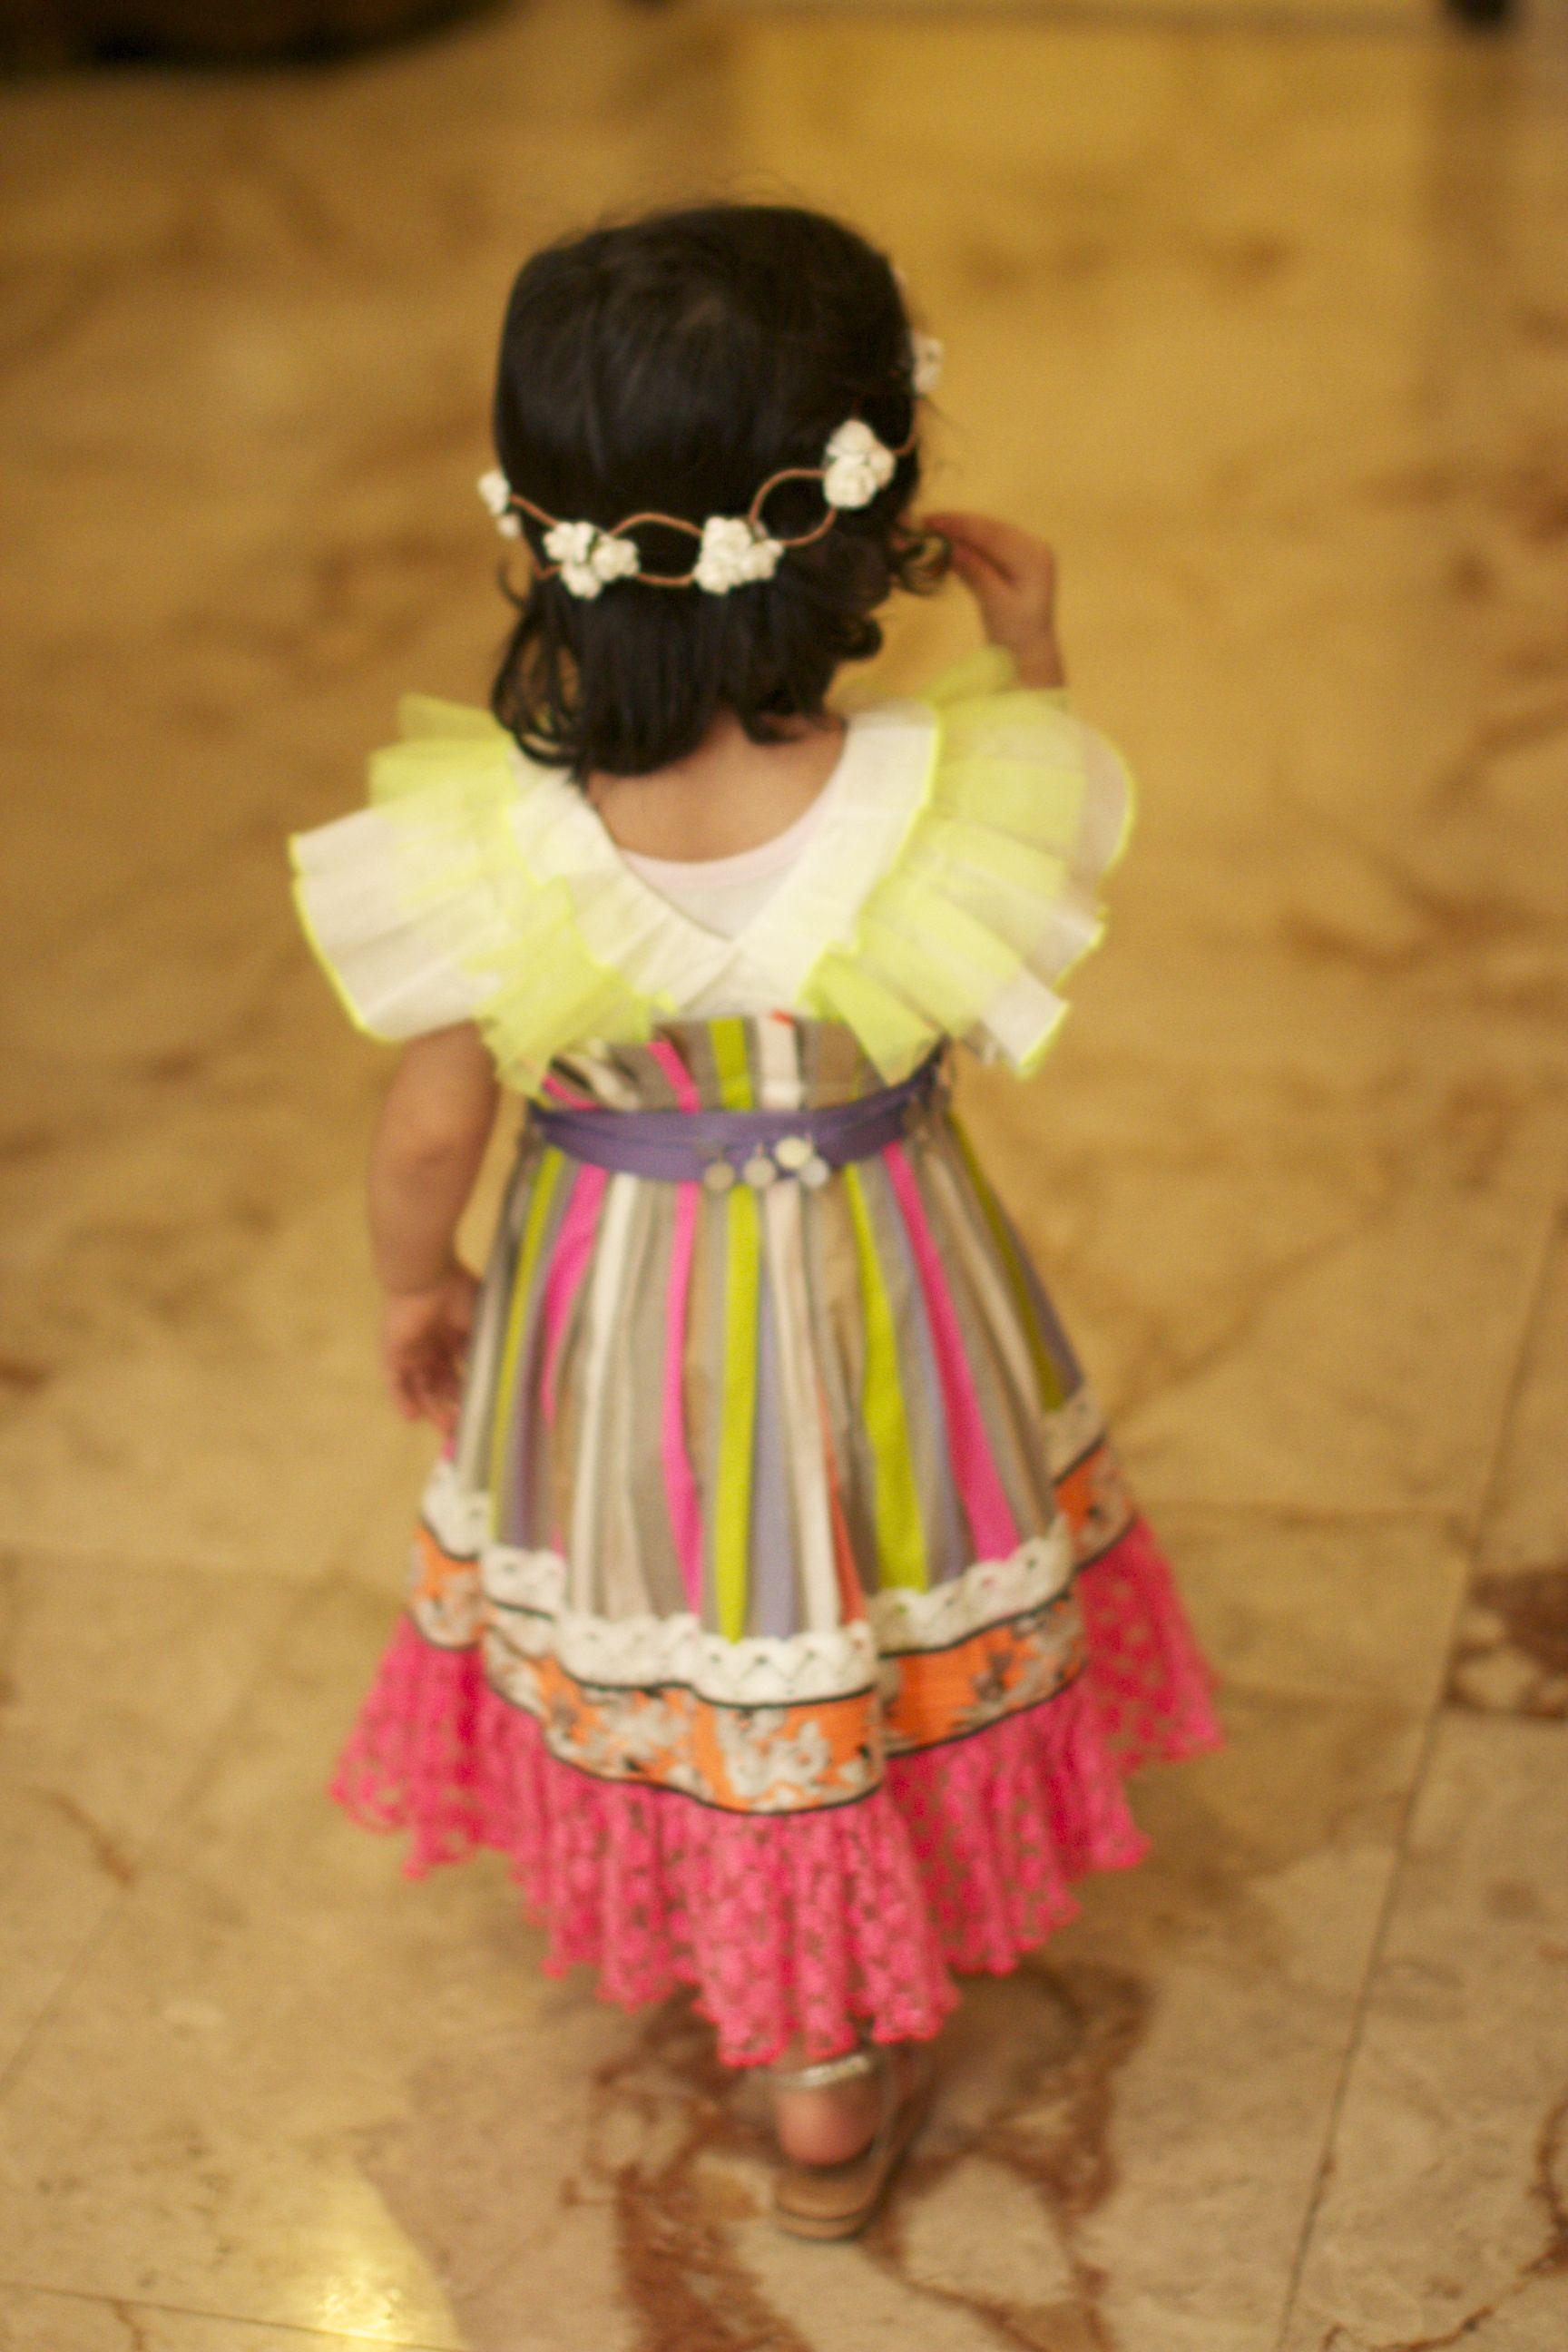 My Baby Girl Wearing Dara A Flower Girl Dresses Girls Wear My Baby Girl